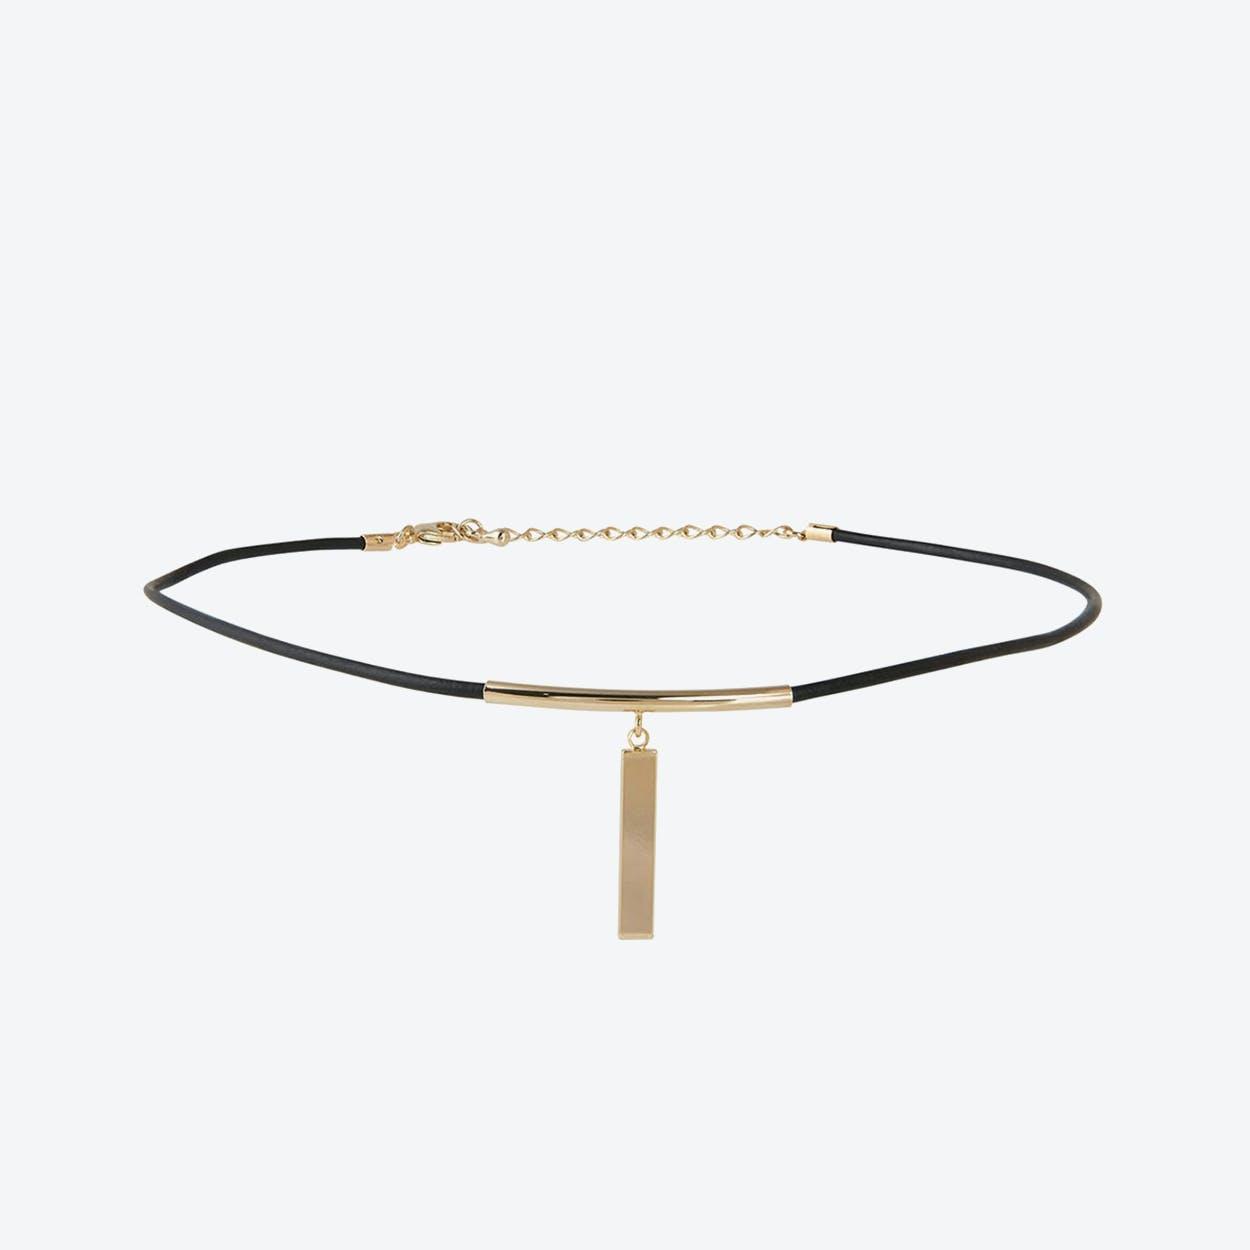 Leather & Bar Choker - Gold